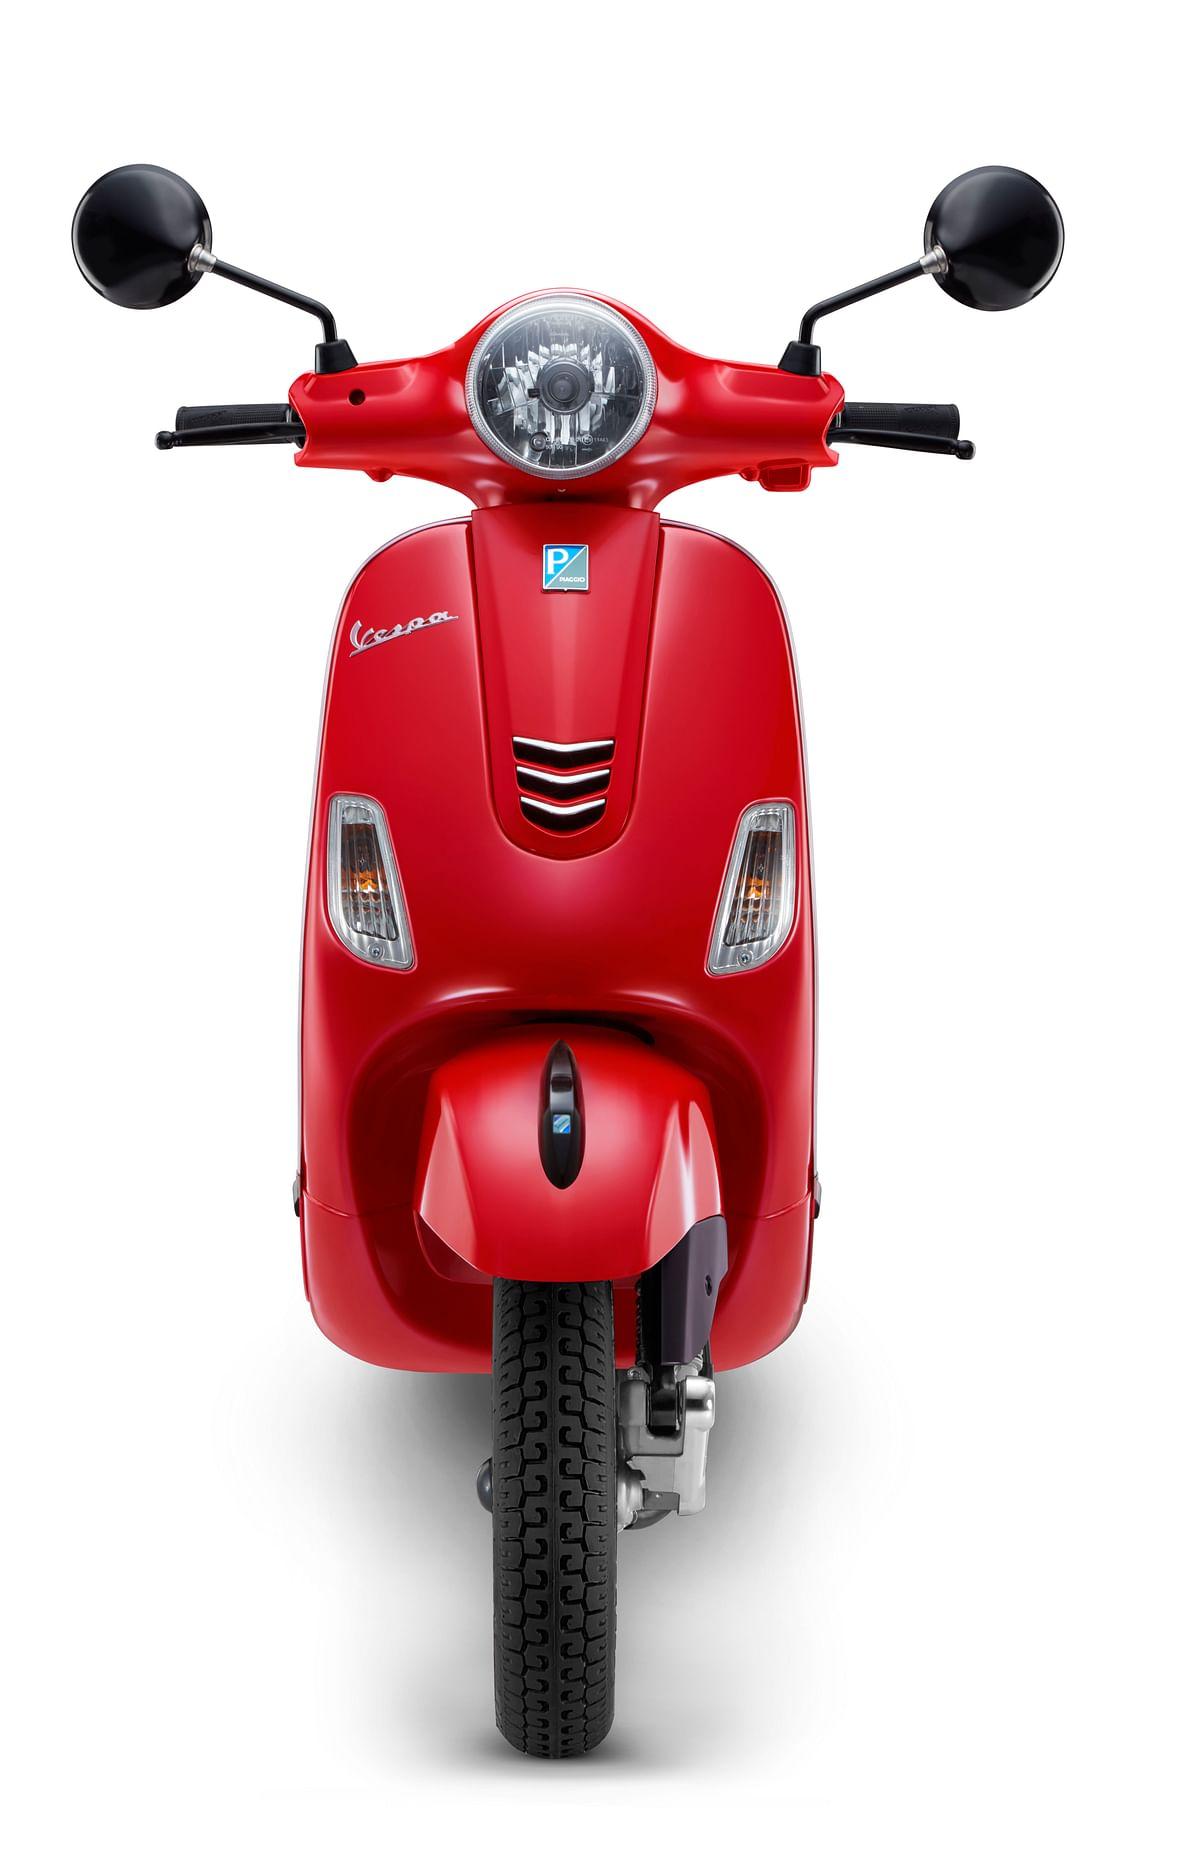 Vespa Urban Club 125 in Glossy Red